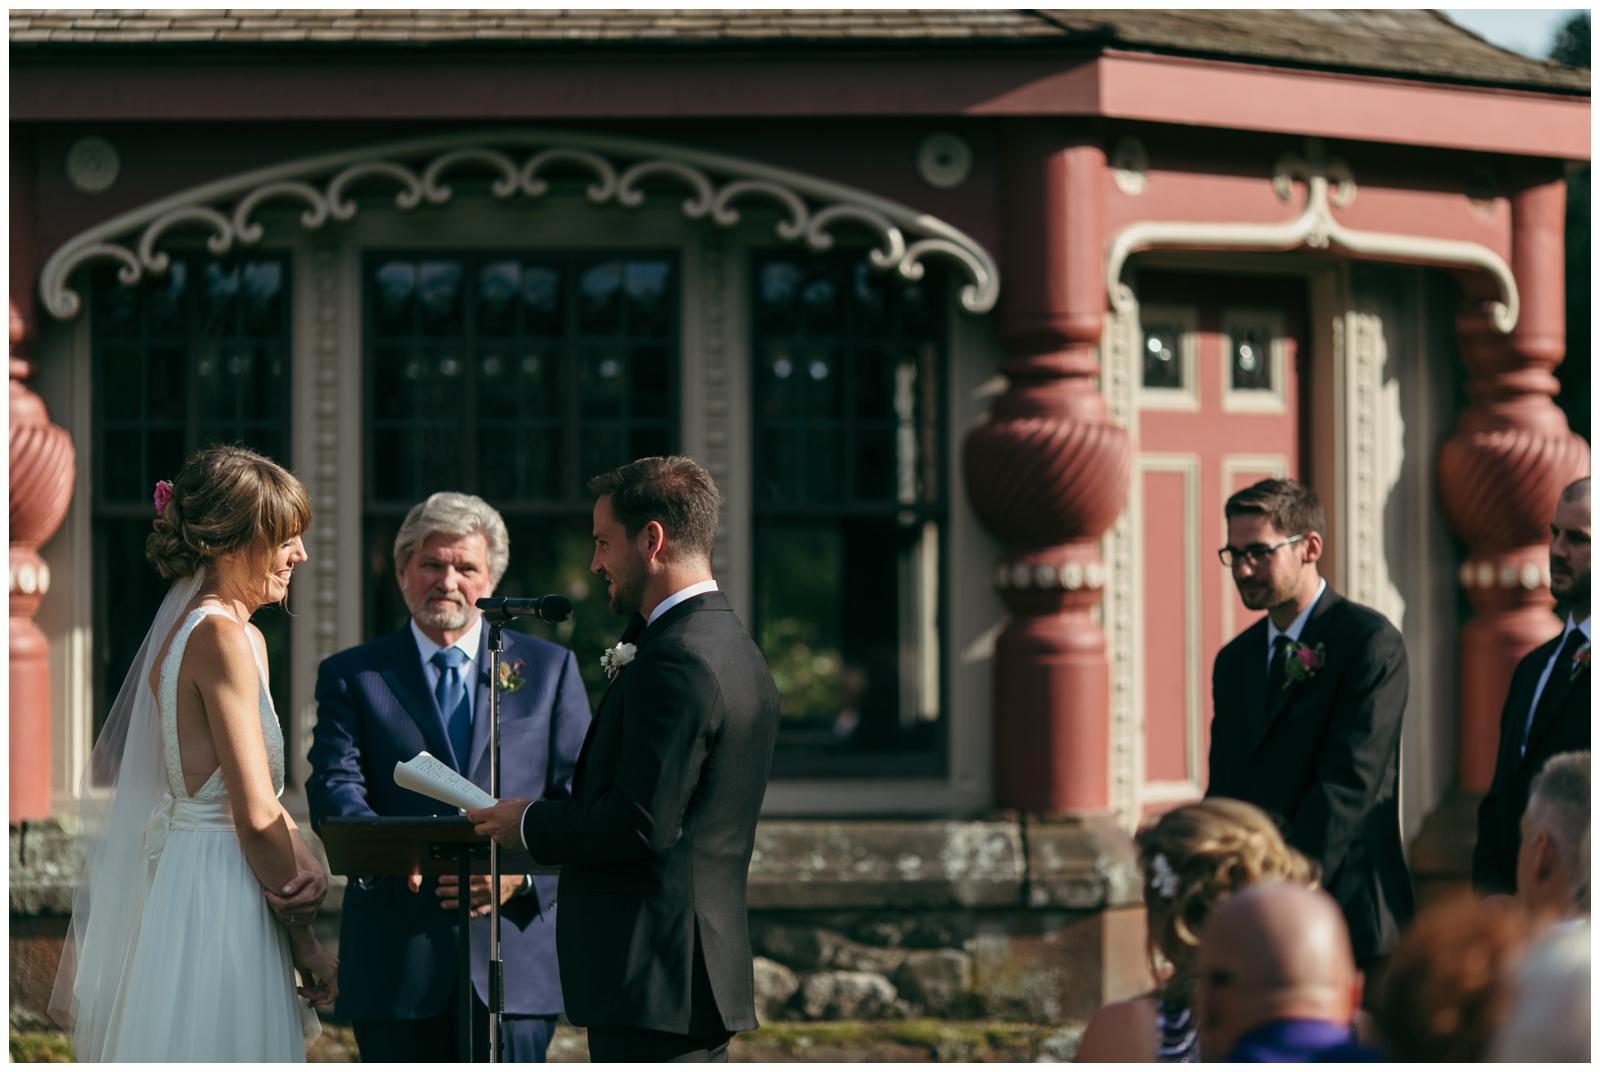 Moraine-Farm-wedding-Bailey-Q-Photo-Massachusetts-wedding-photpgrapher-076.jpg